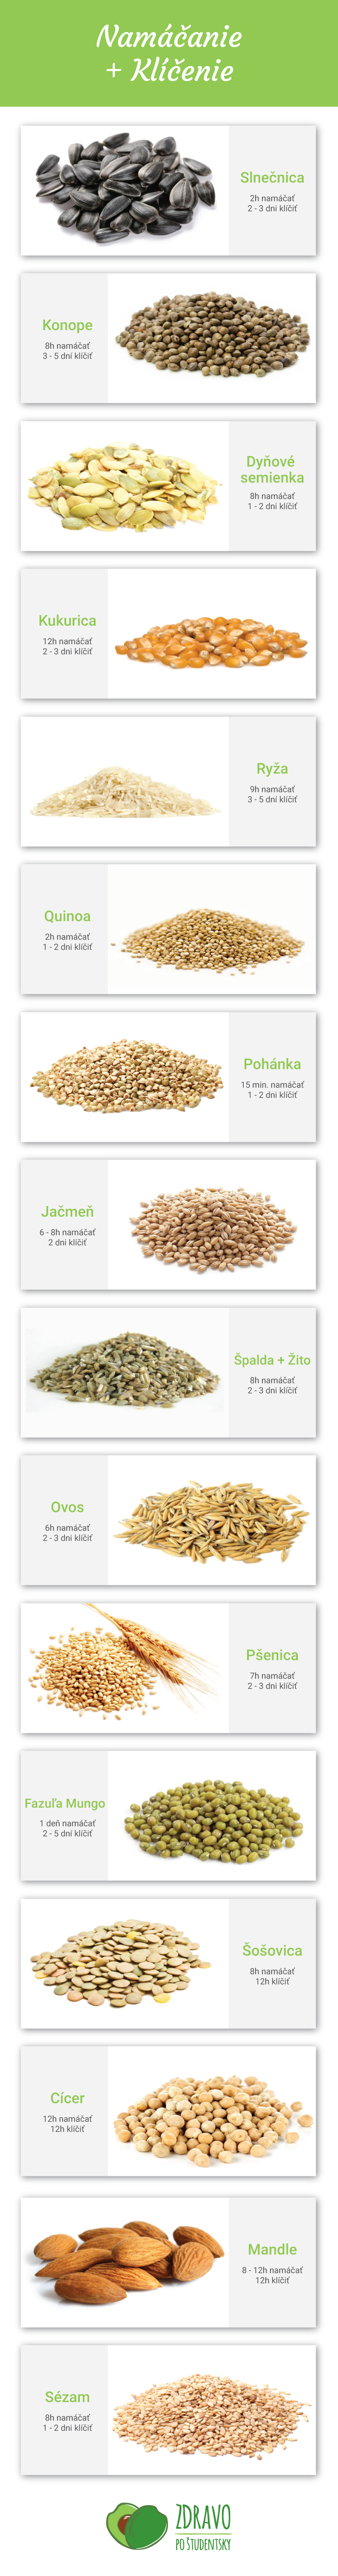 navod-doba-klicenia-a-namacania-semienok